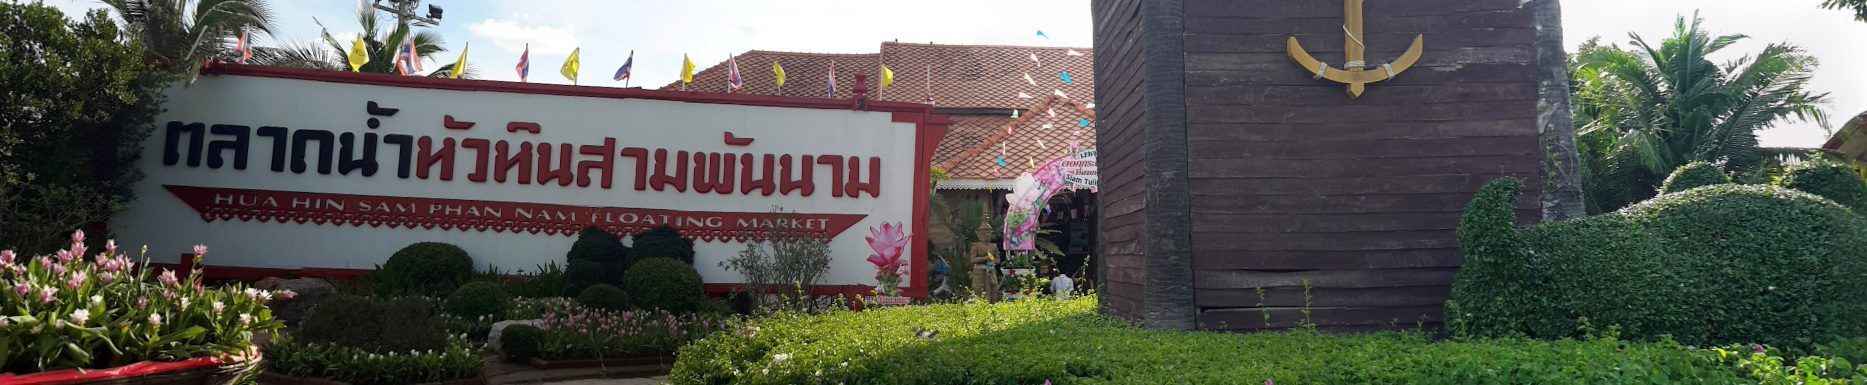 Huahinsamphannam-Floatingmarket  ตลาดน้ำหัวหินสามพันนาม